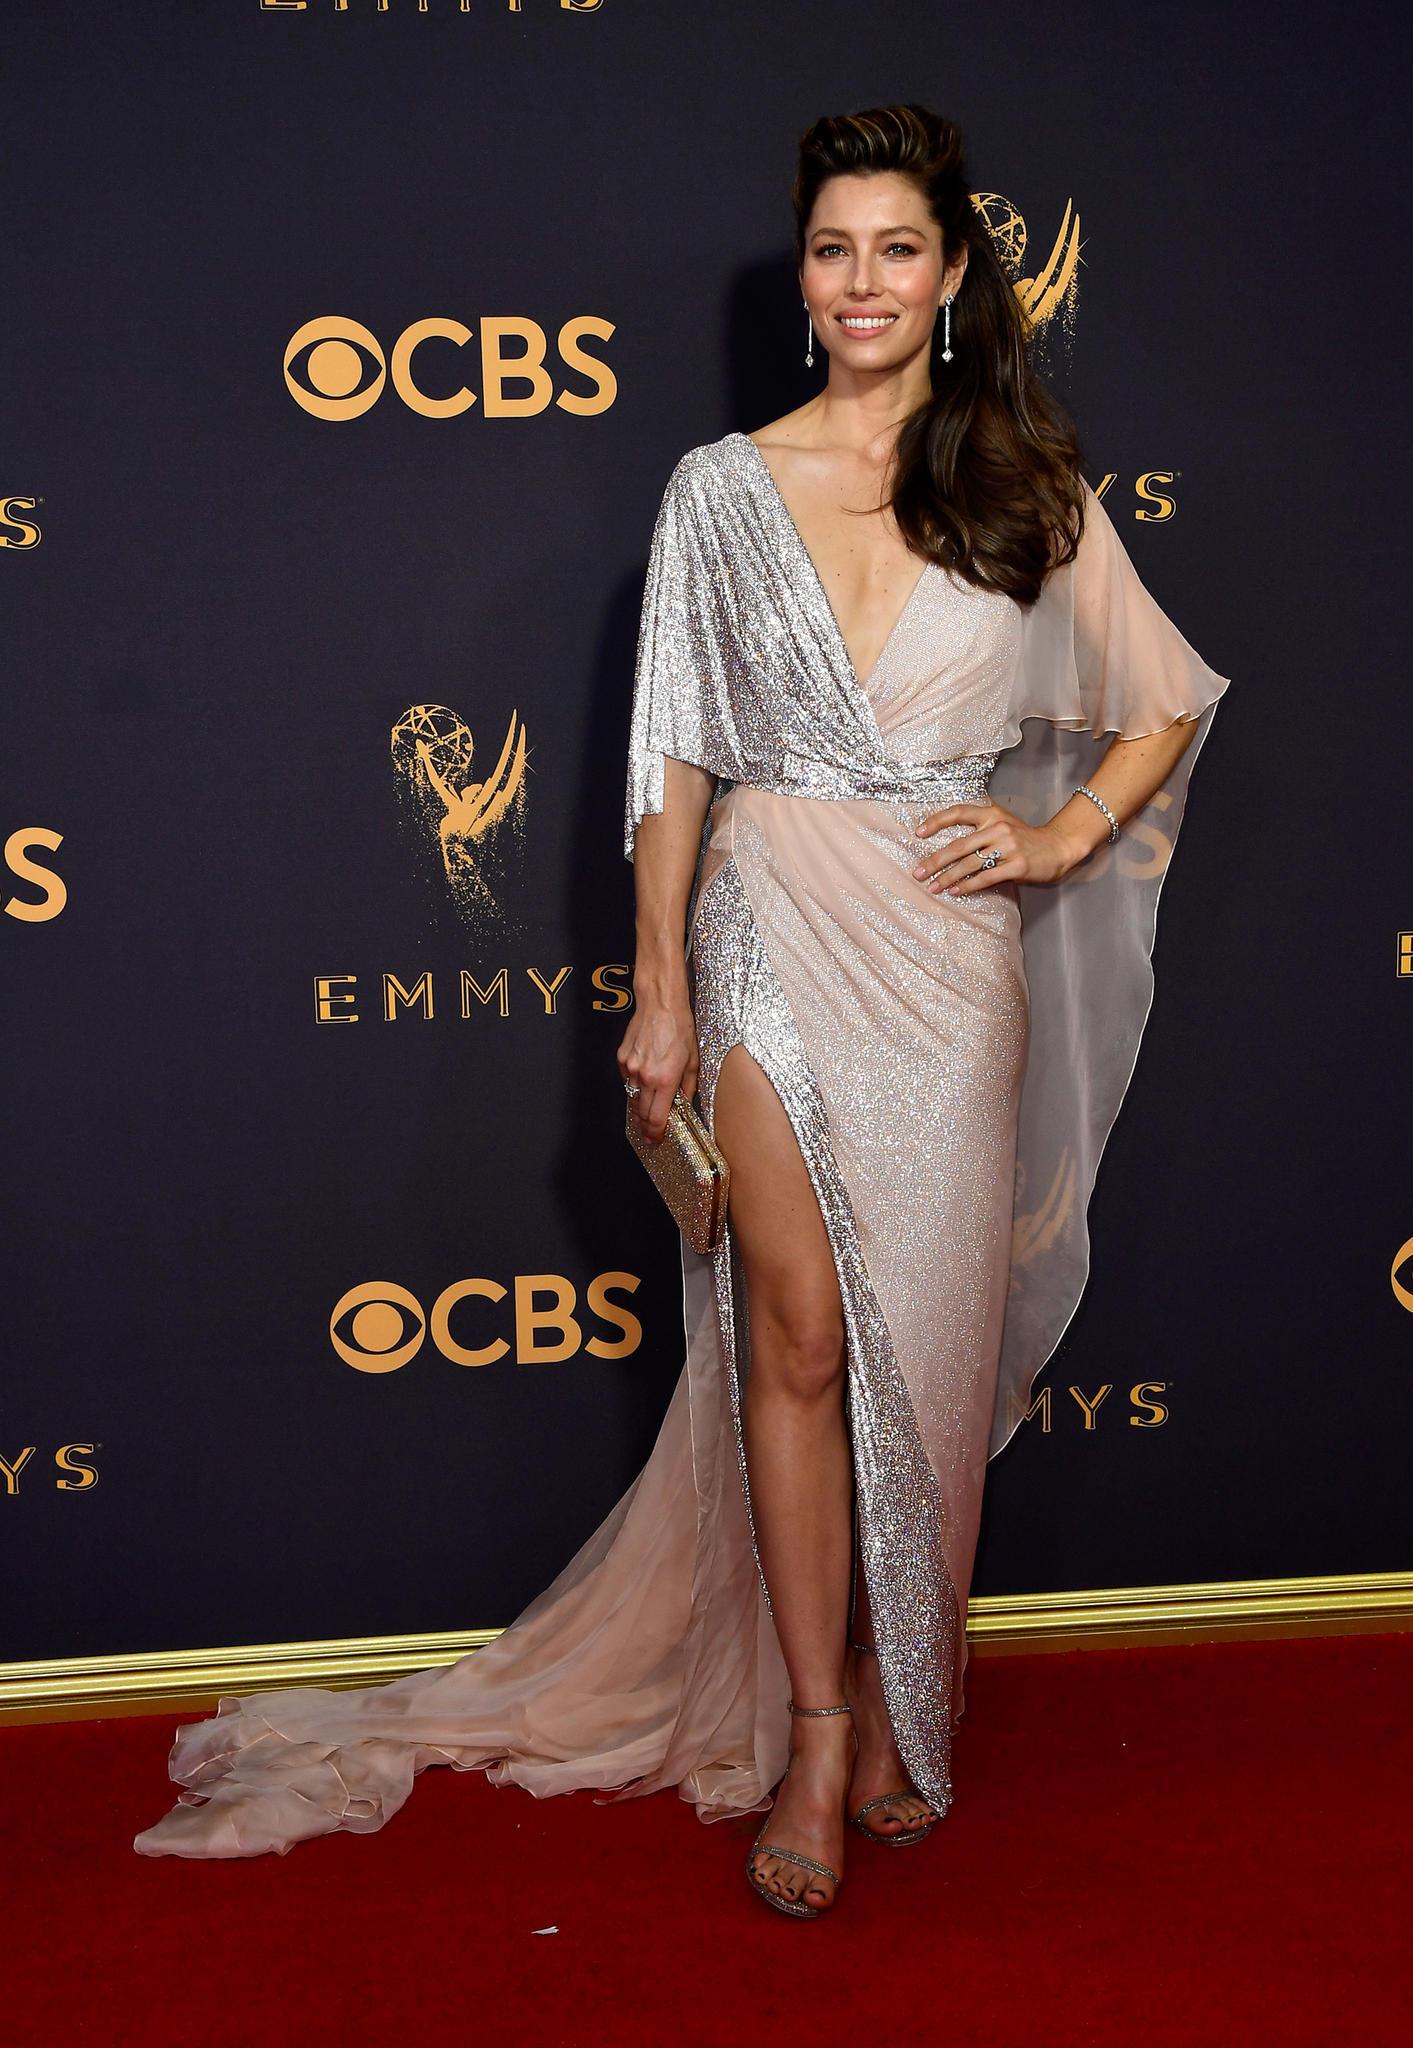 Emmys 2017 mit Jessica Biel